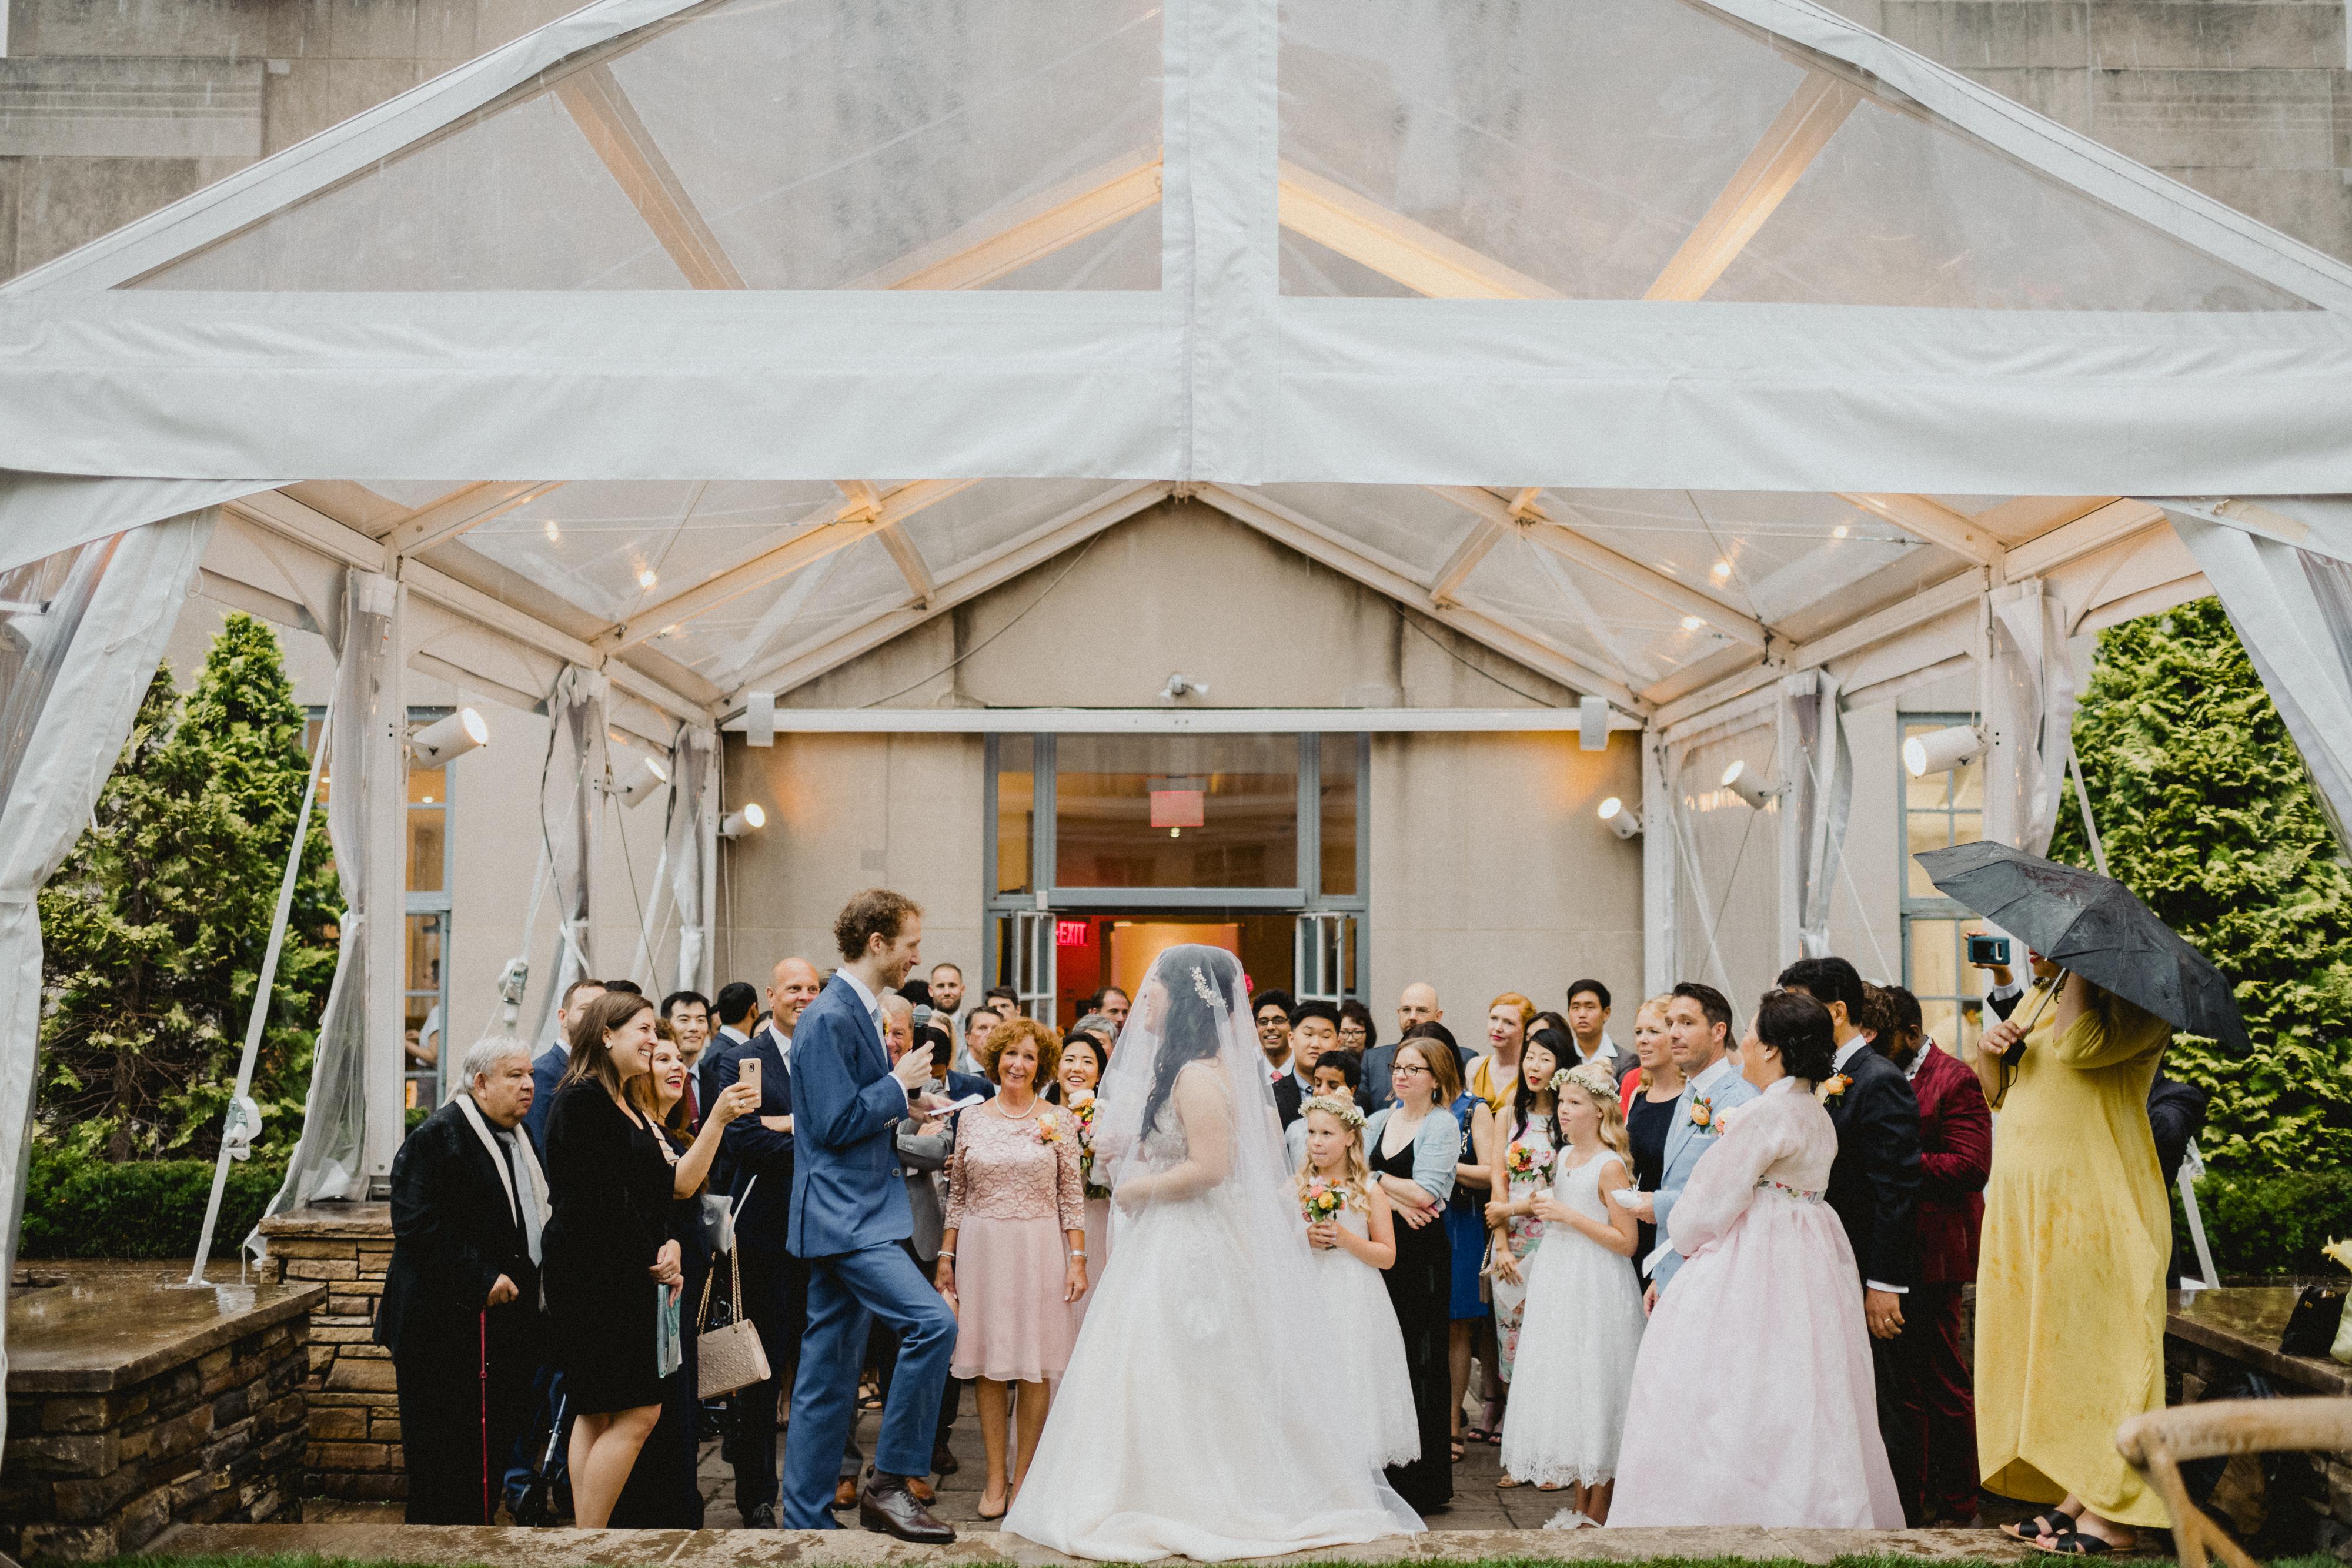 620 Loft & Garden - Aug 2019